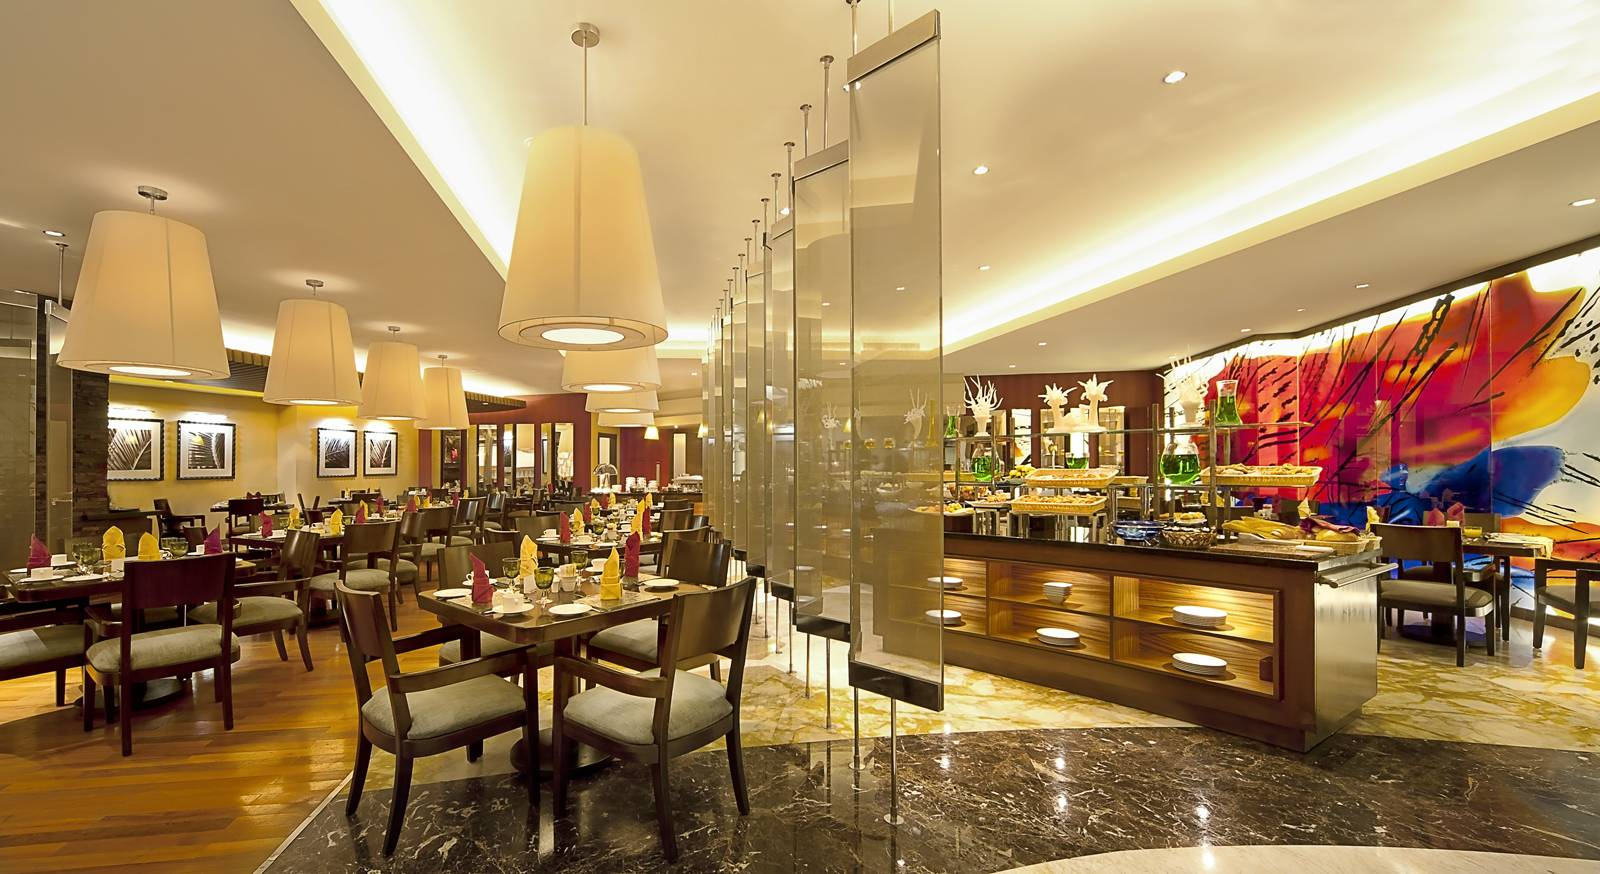 Gulf Hotel Bahrain Best Restaurants And Dining International Buffet Al Waha